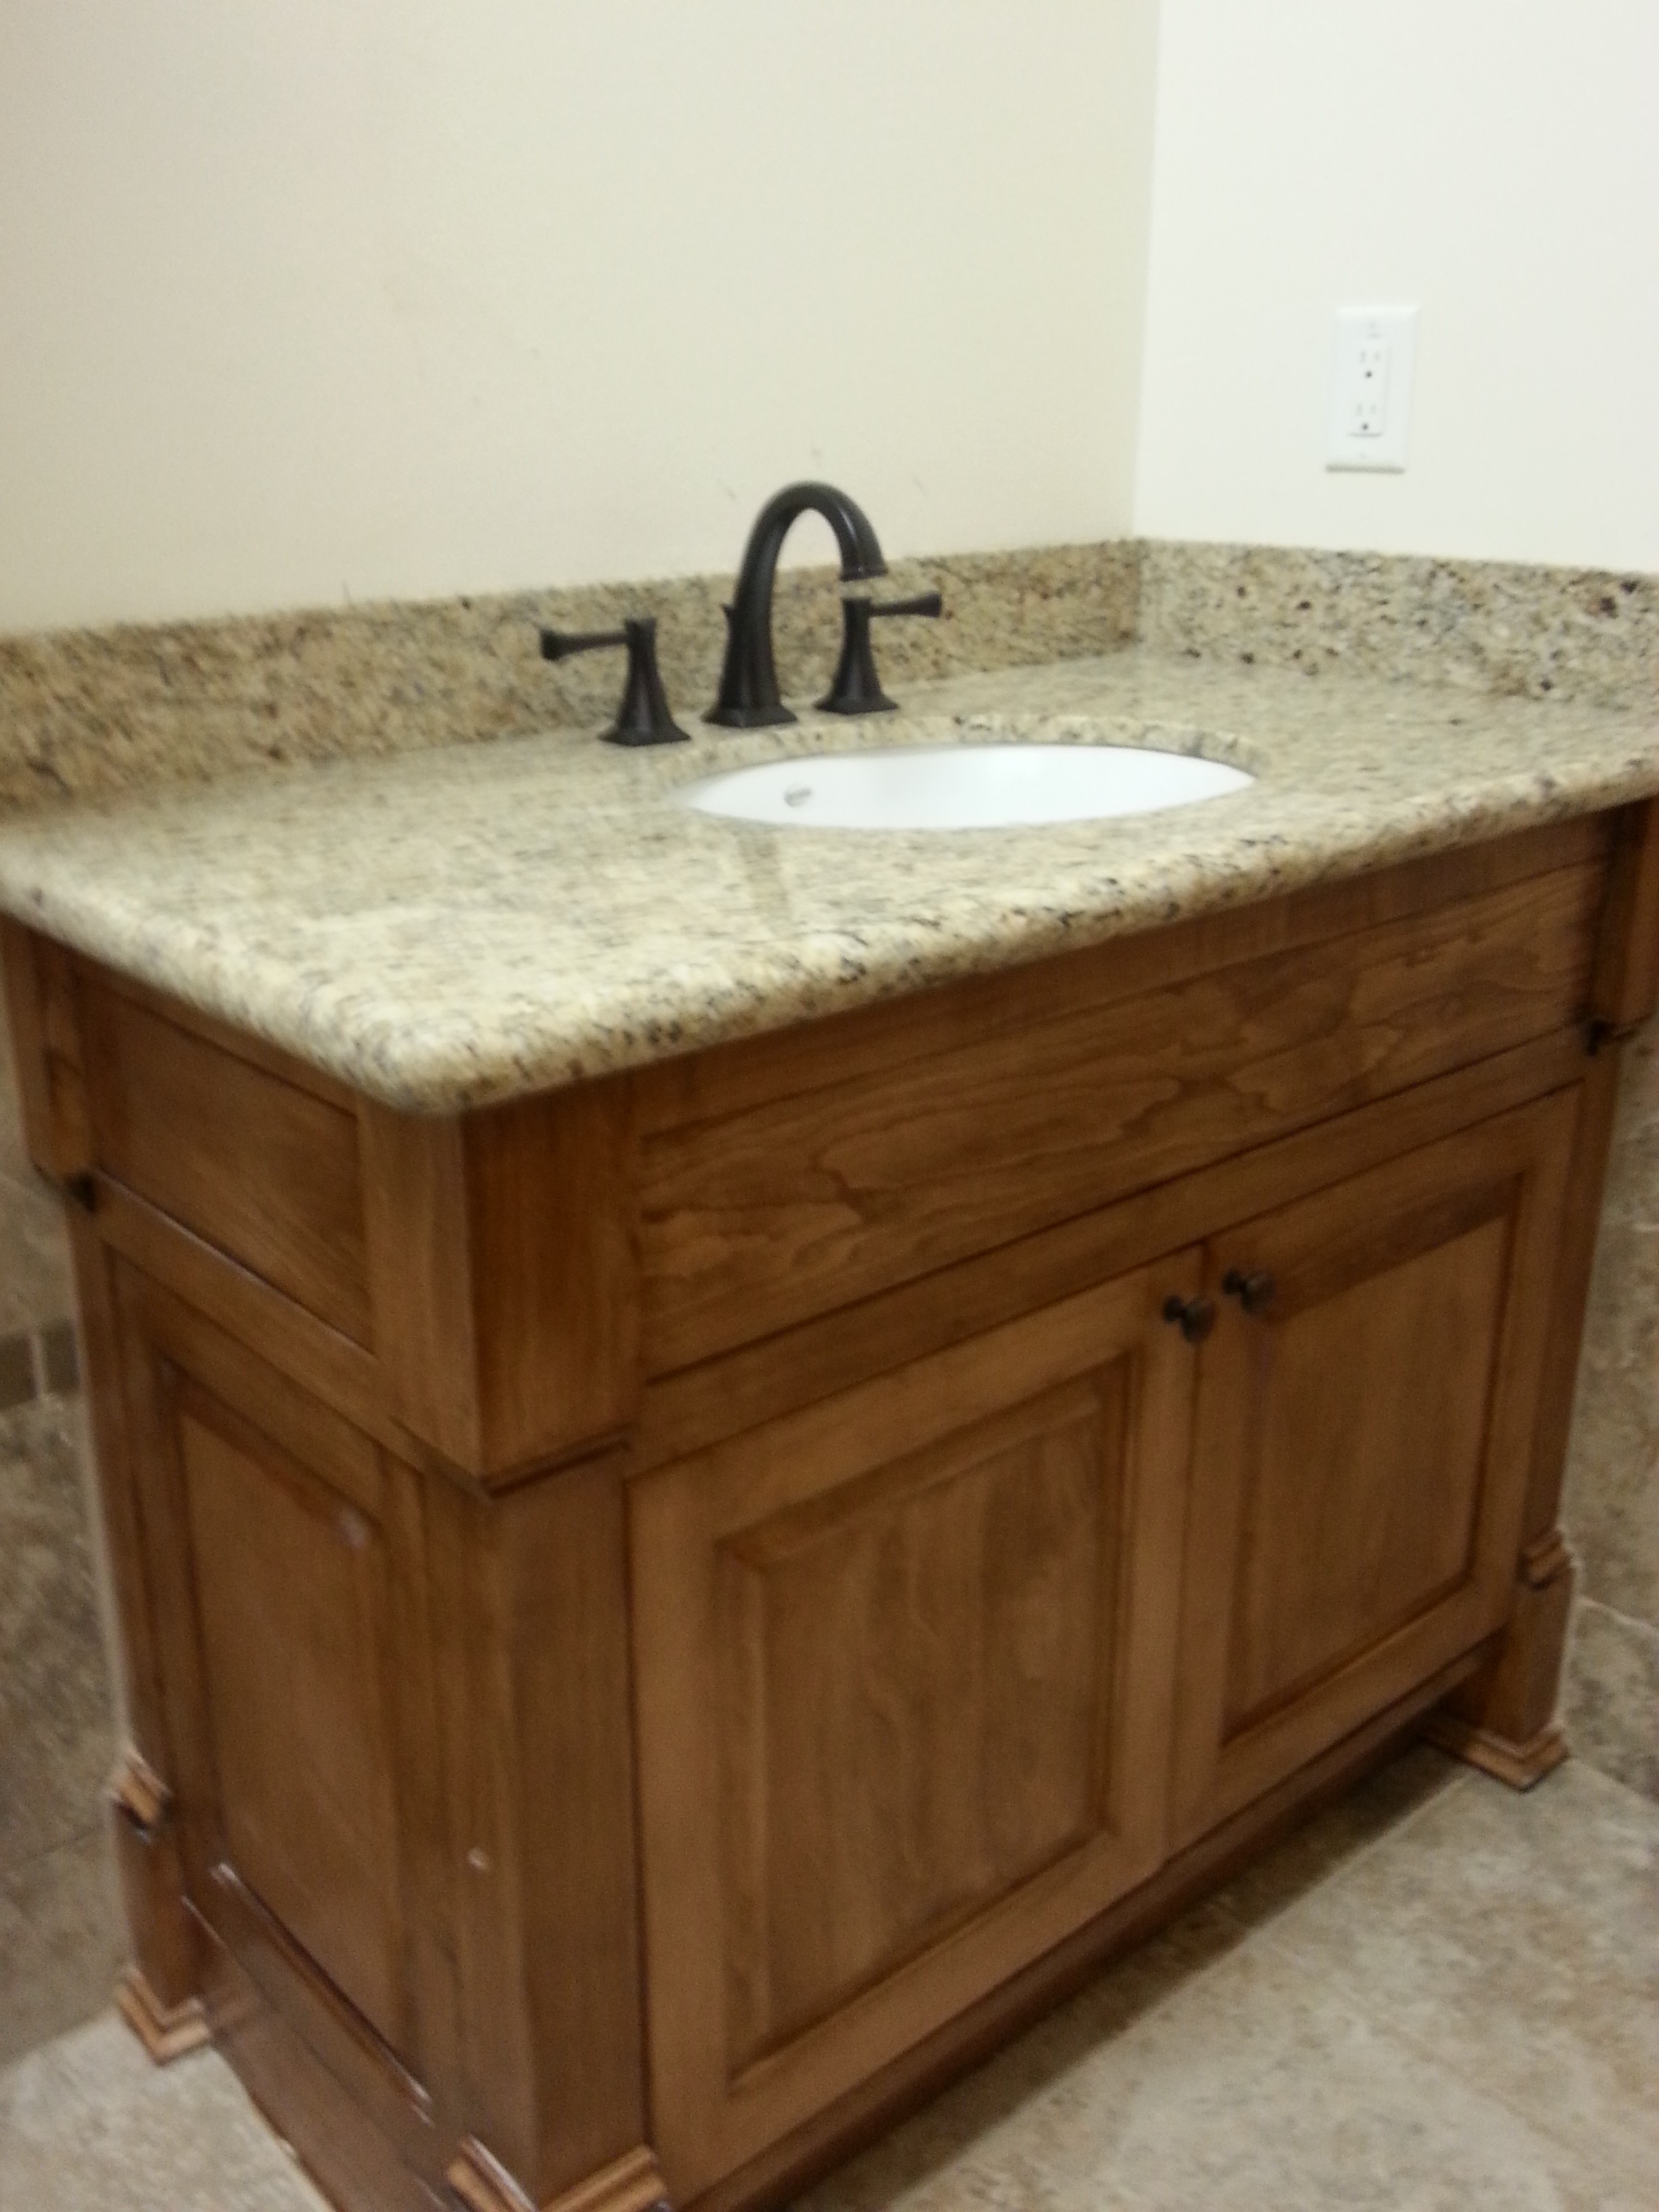 Solid Wood Bathroom Vanity with Marble Countertop  Delta